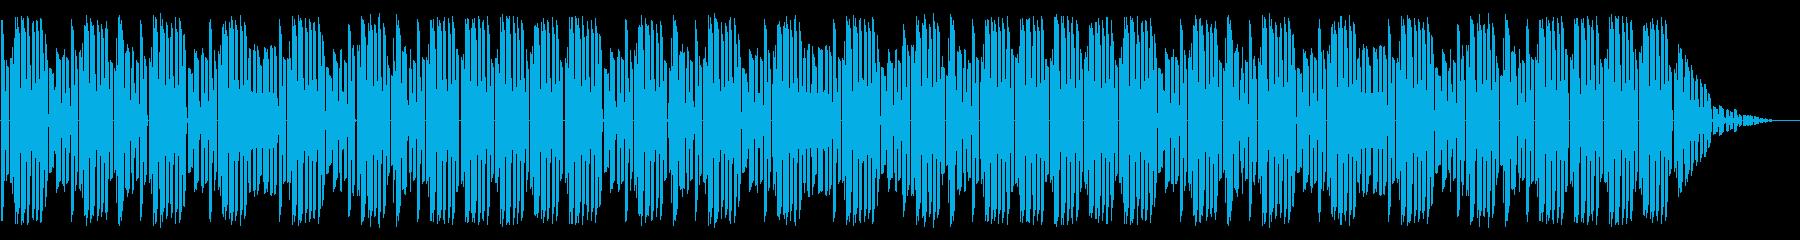 NES STG B02-1(ステージ) の再生済みの波形